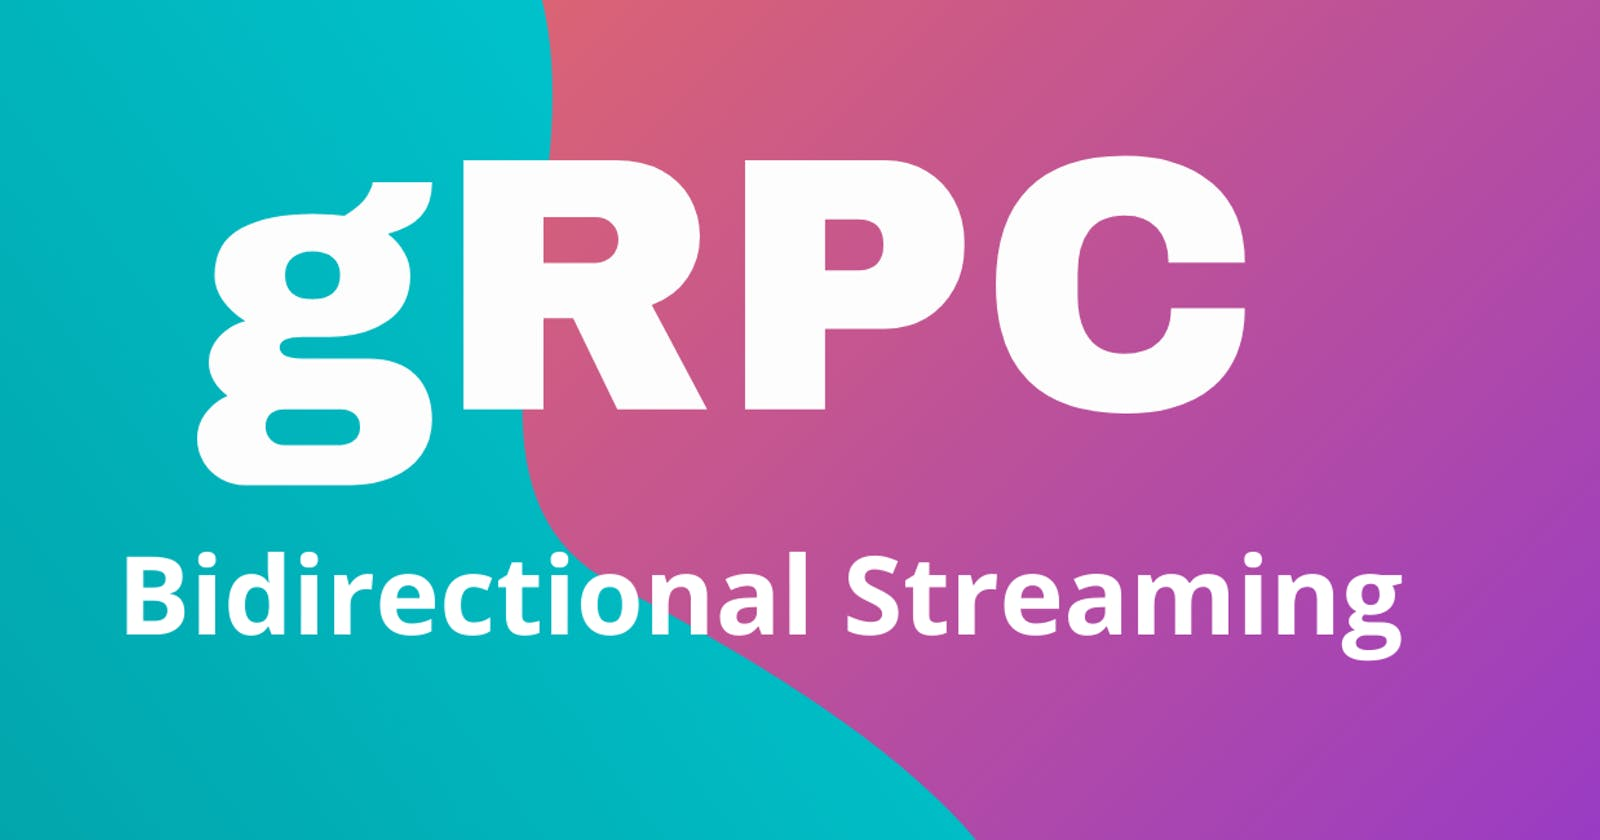 CHAT-SERVER using gRPC Bidirectional Streaming